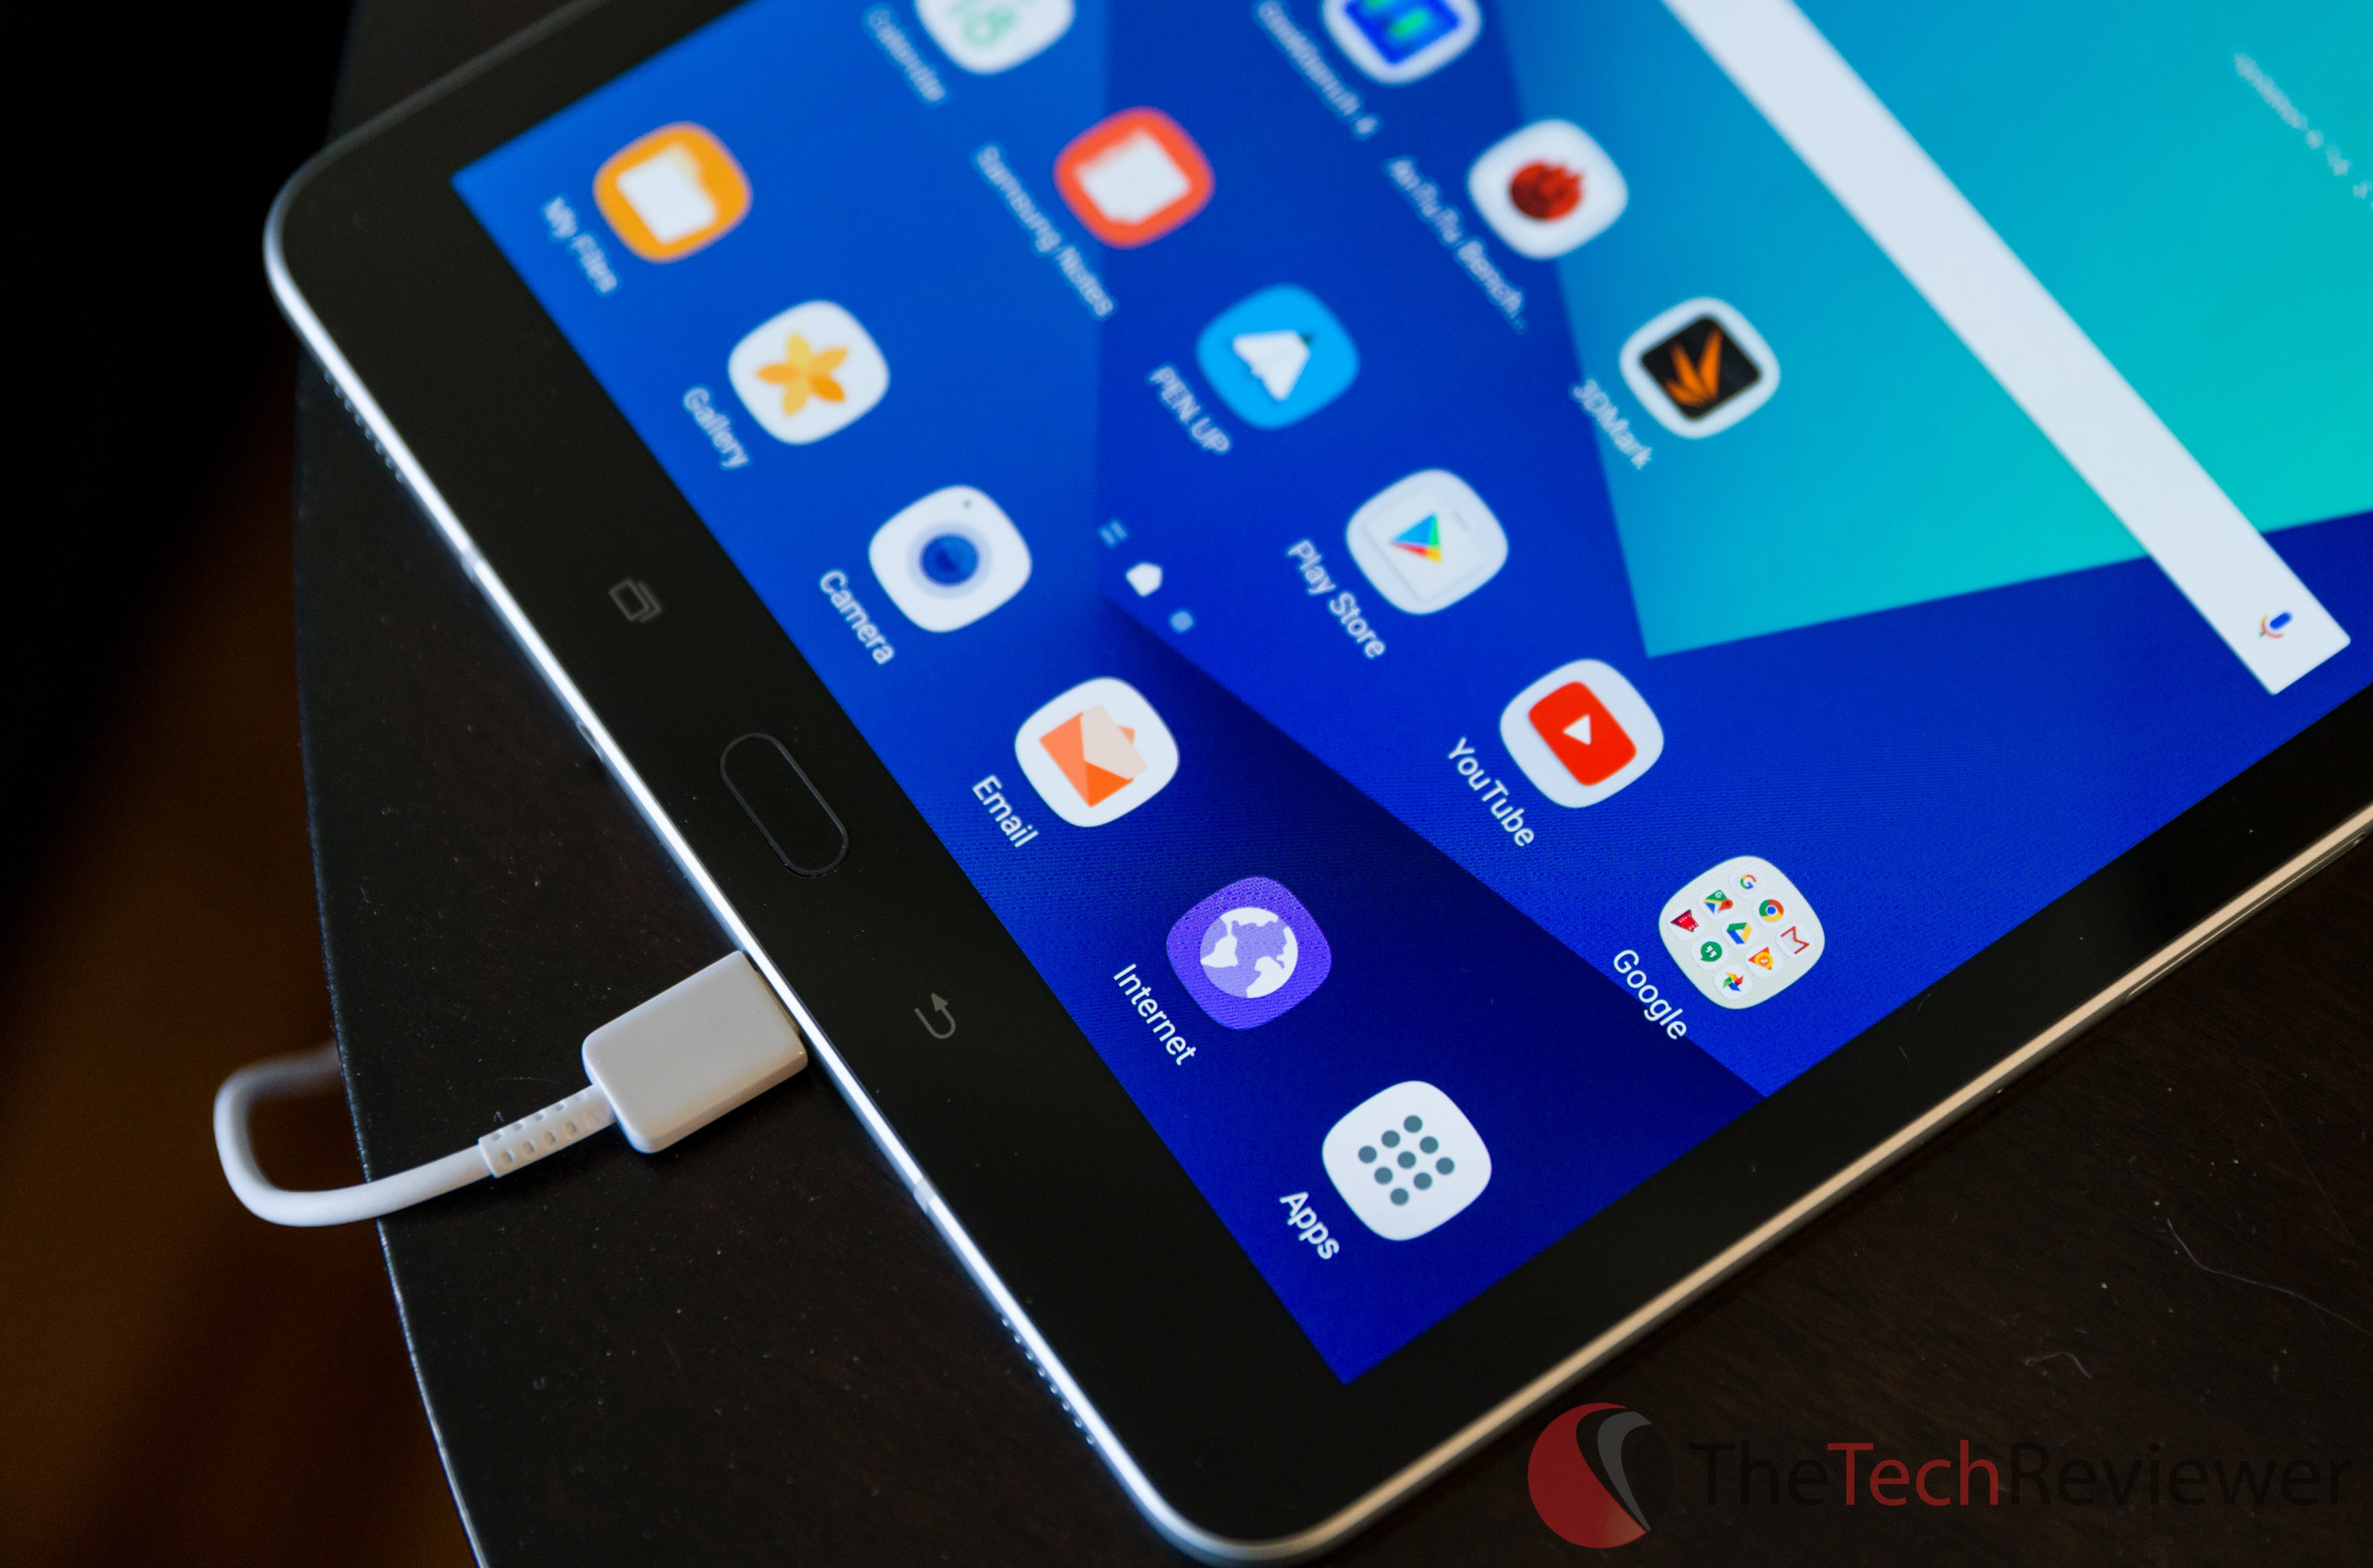 Samsung Galaxy Tab S3 1 of 10